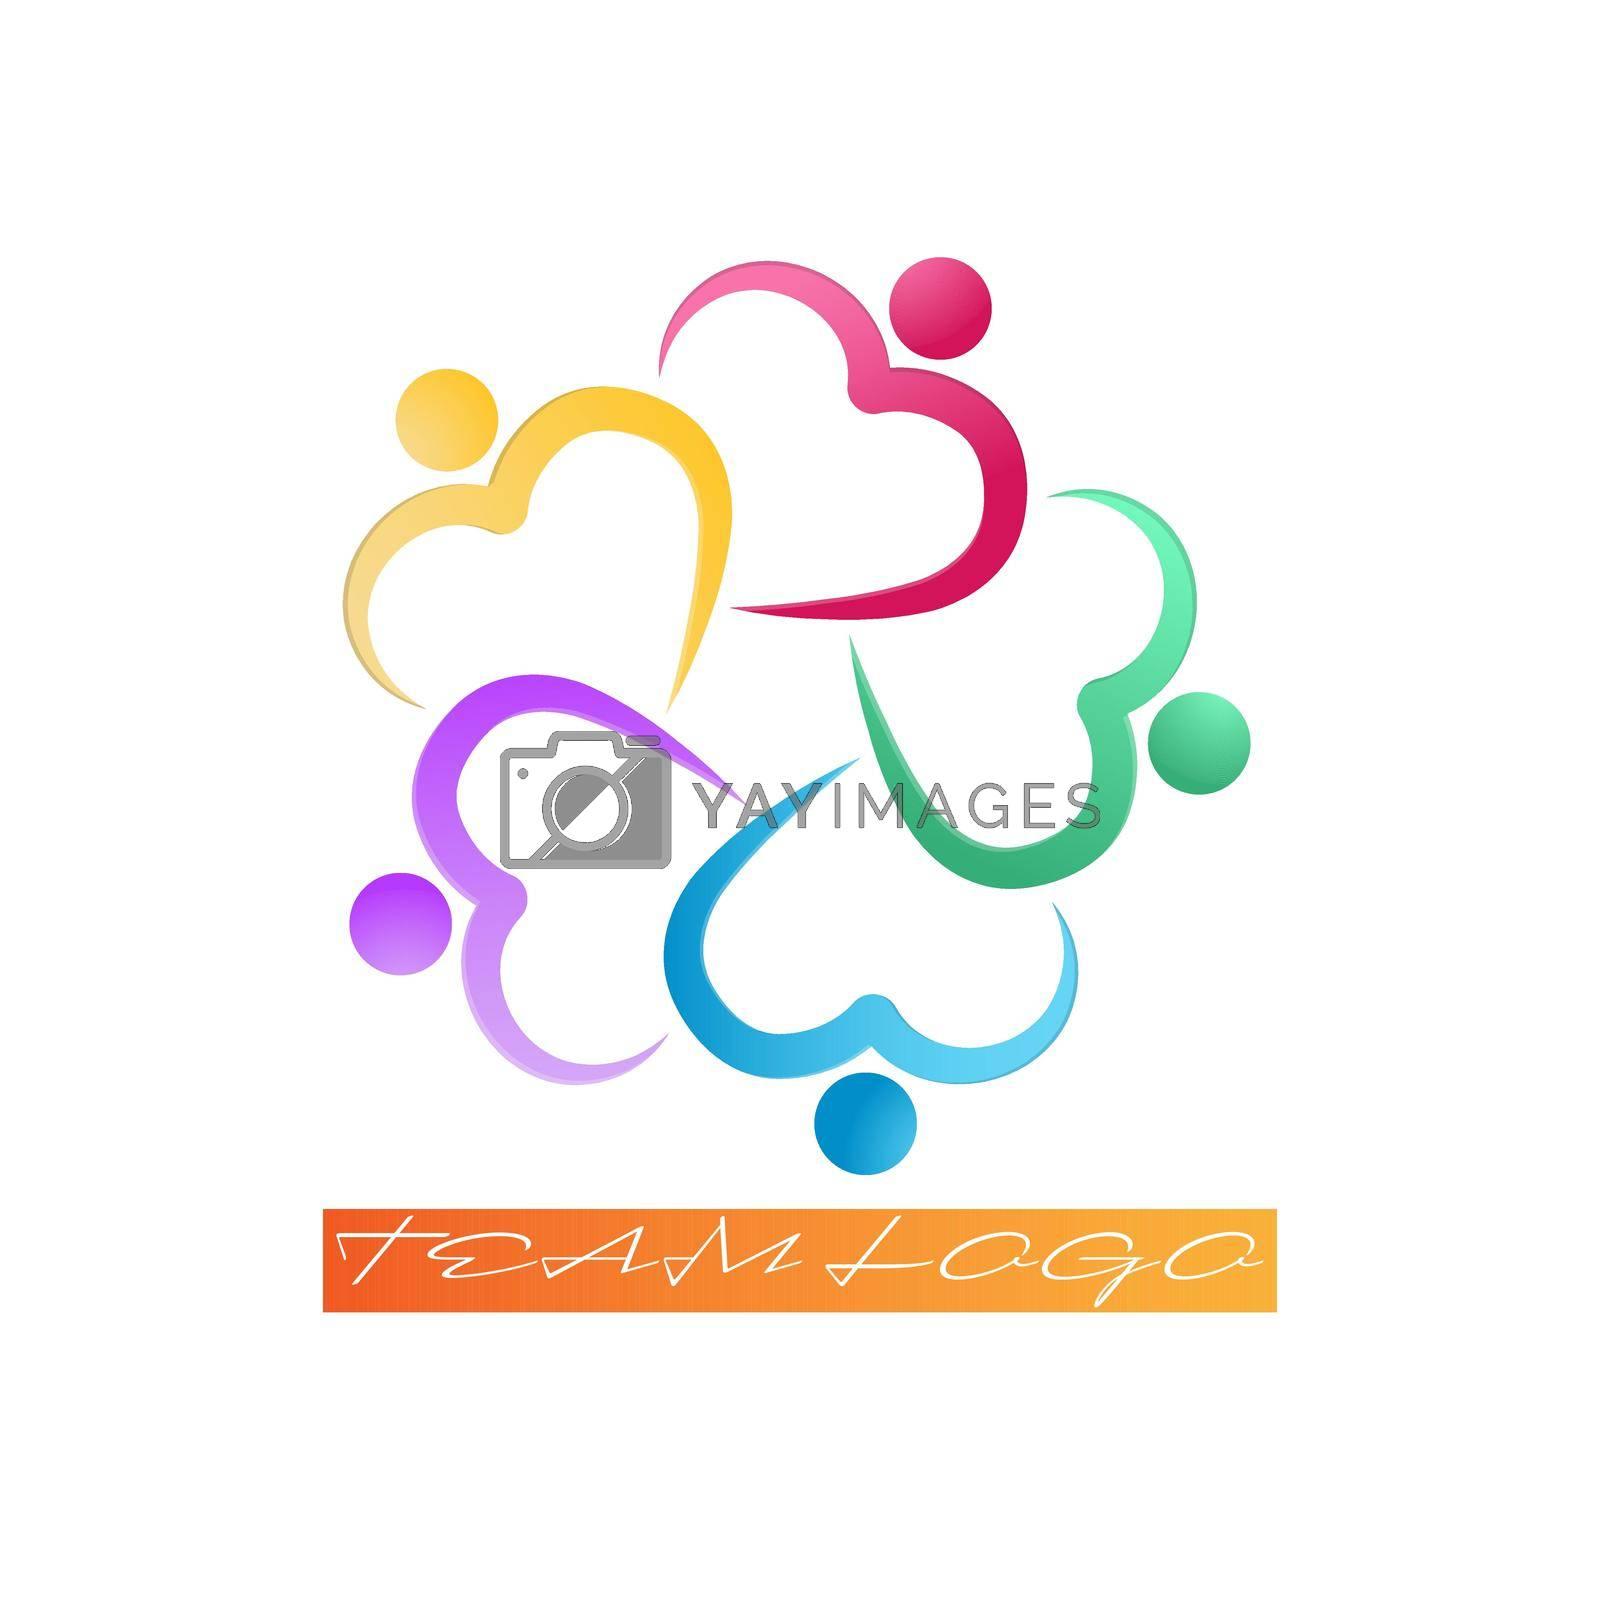 Team logo, like-minded people or friends, social logo. Hugging hearts. Simple design.